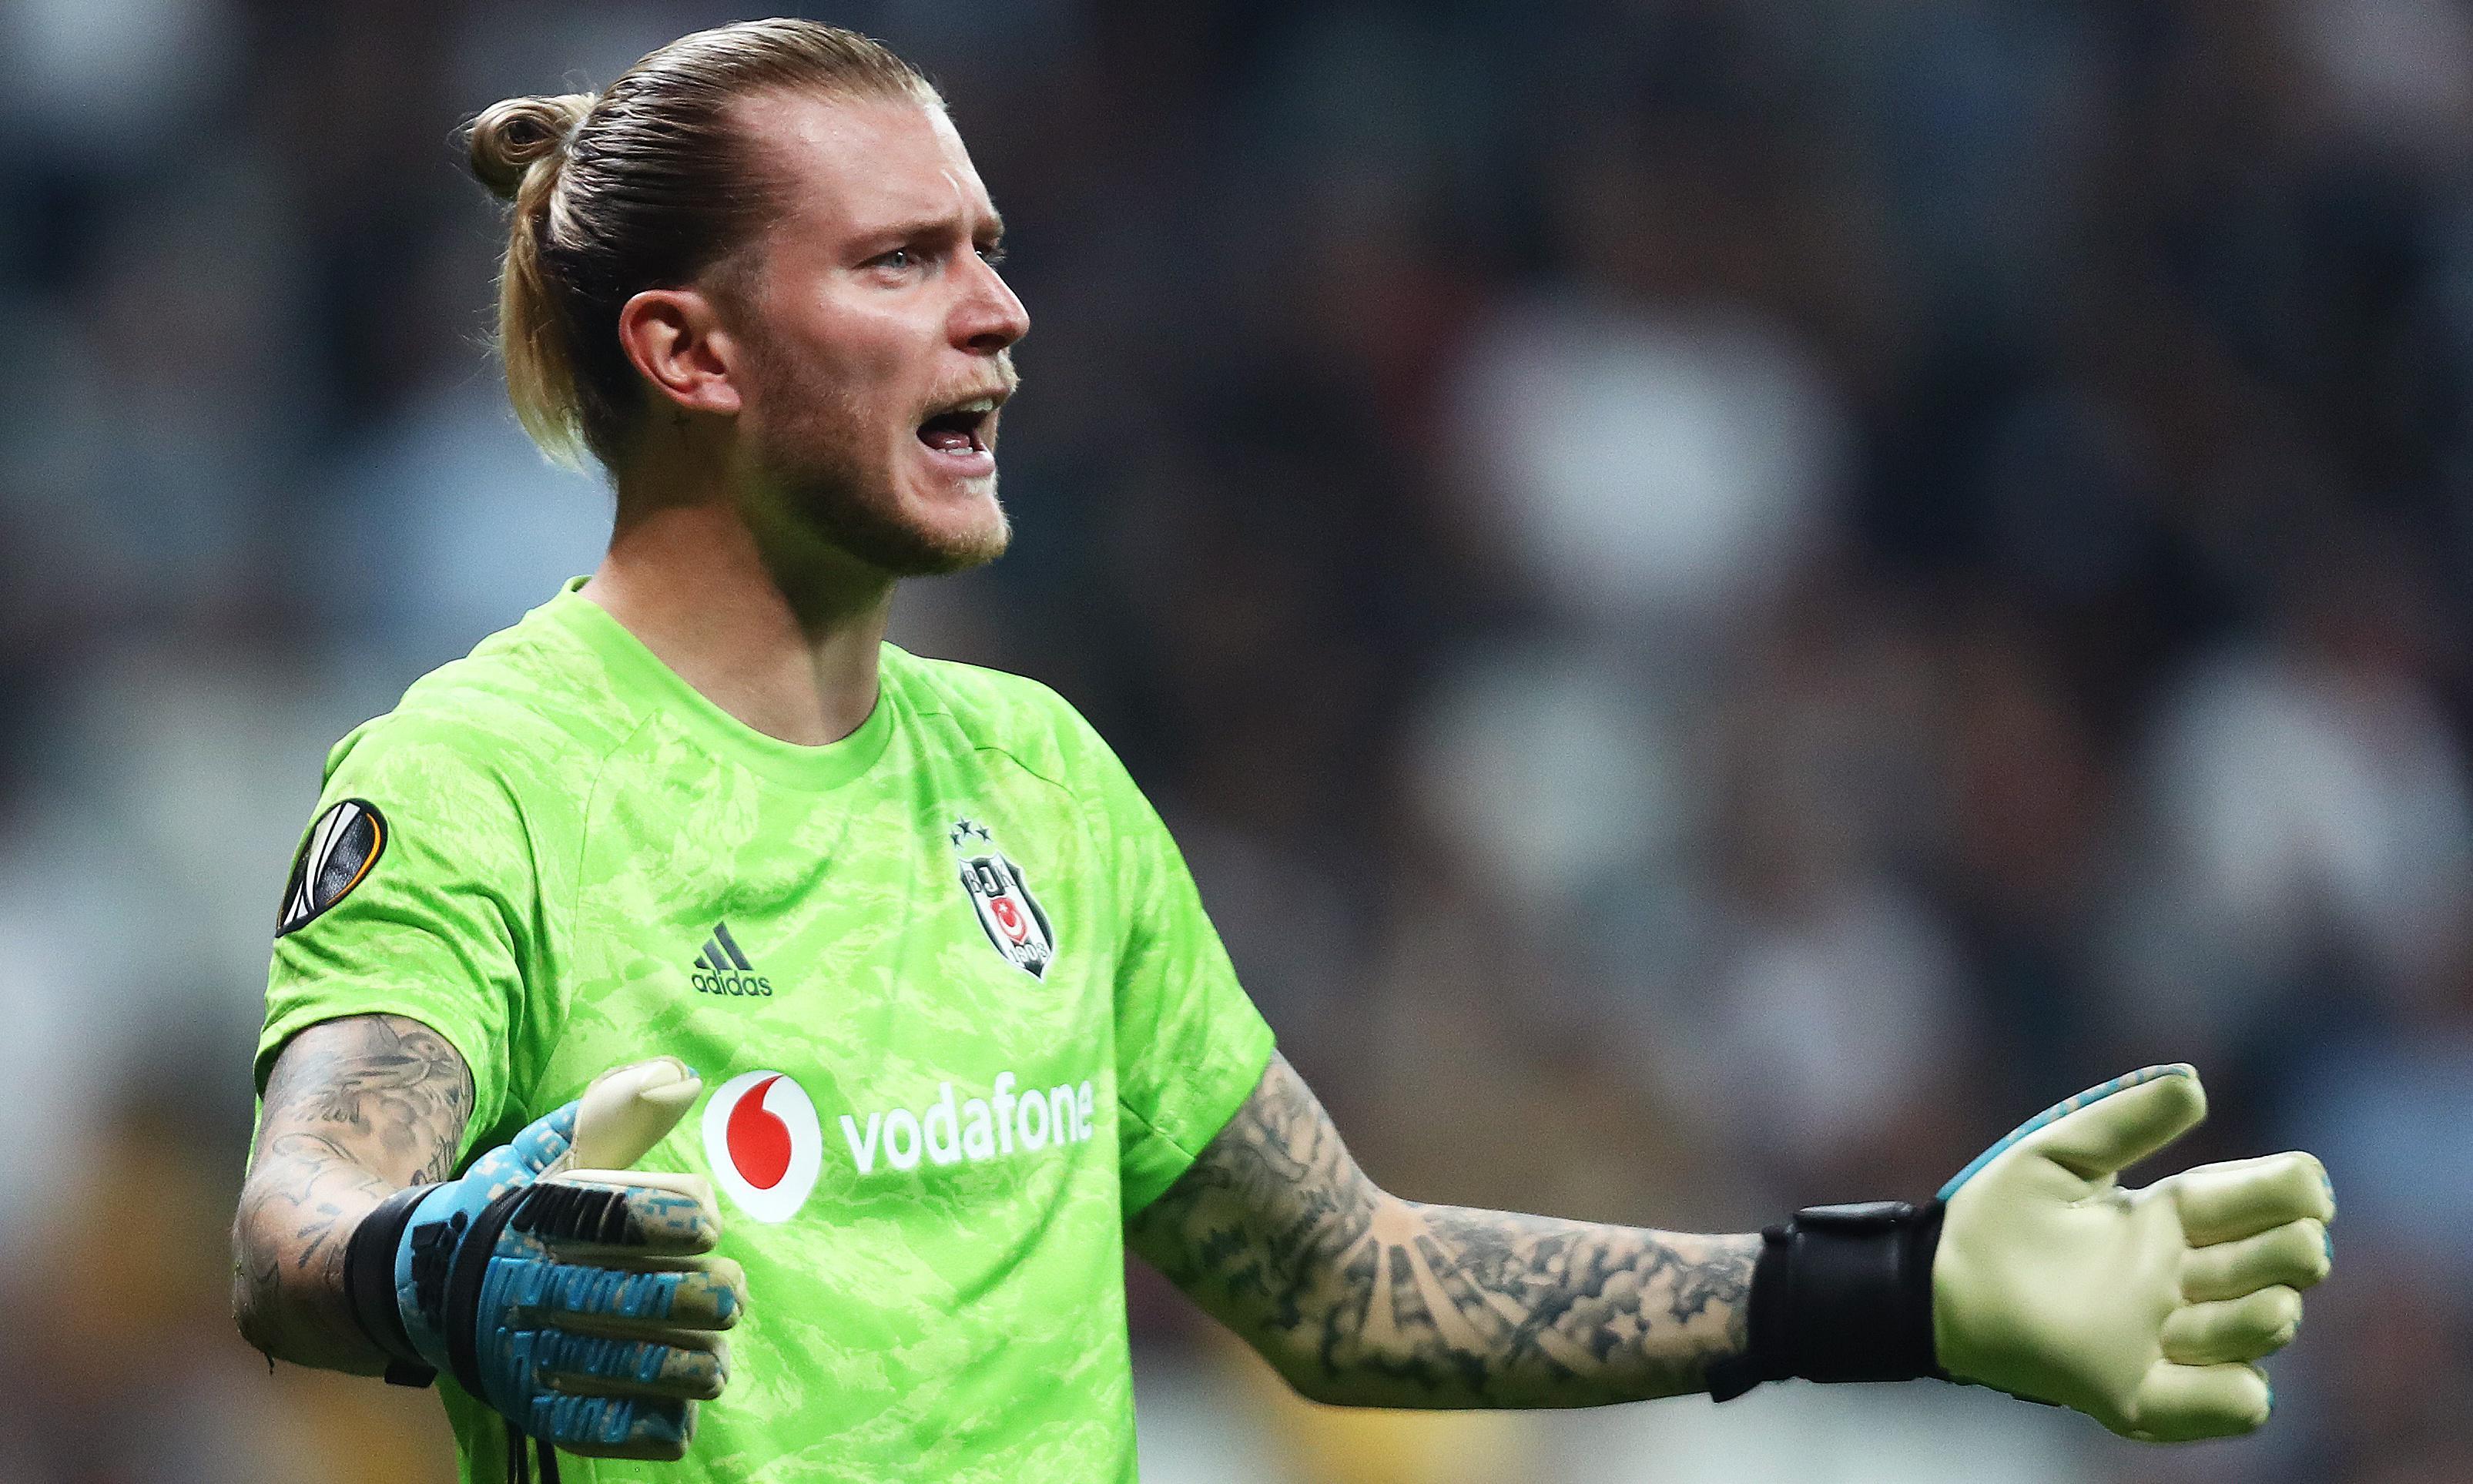 Loris Karius hopes to play for Liverpool again after Besiktas loan